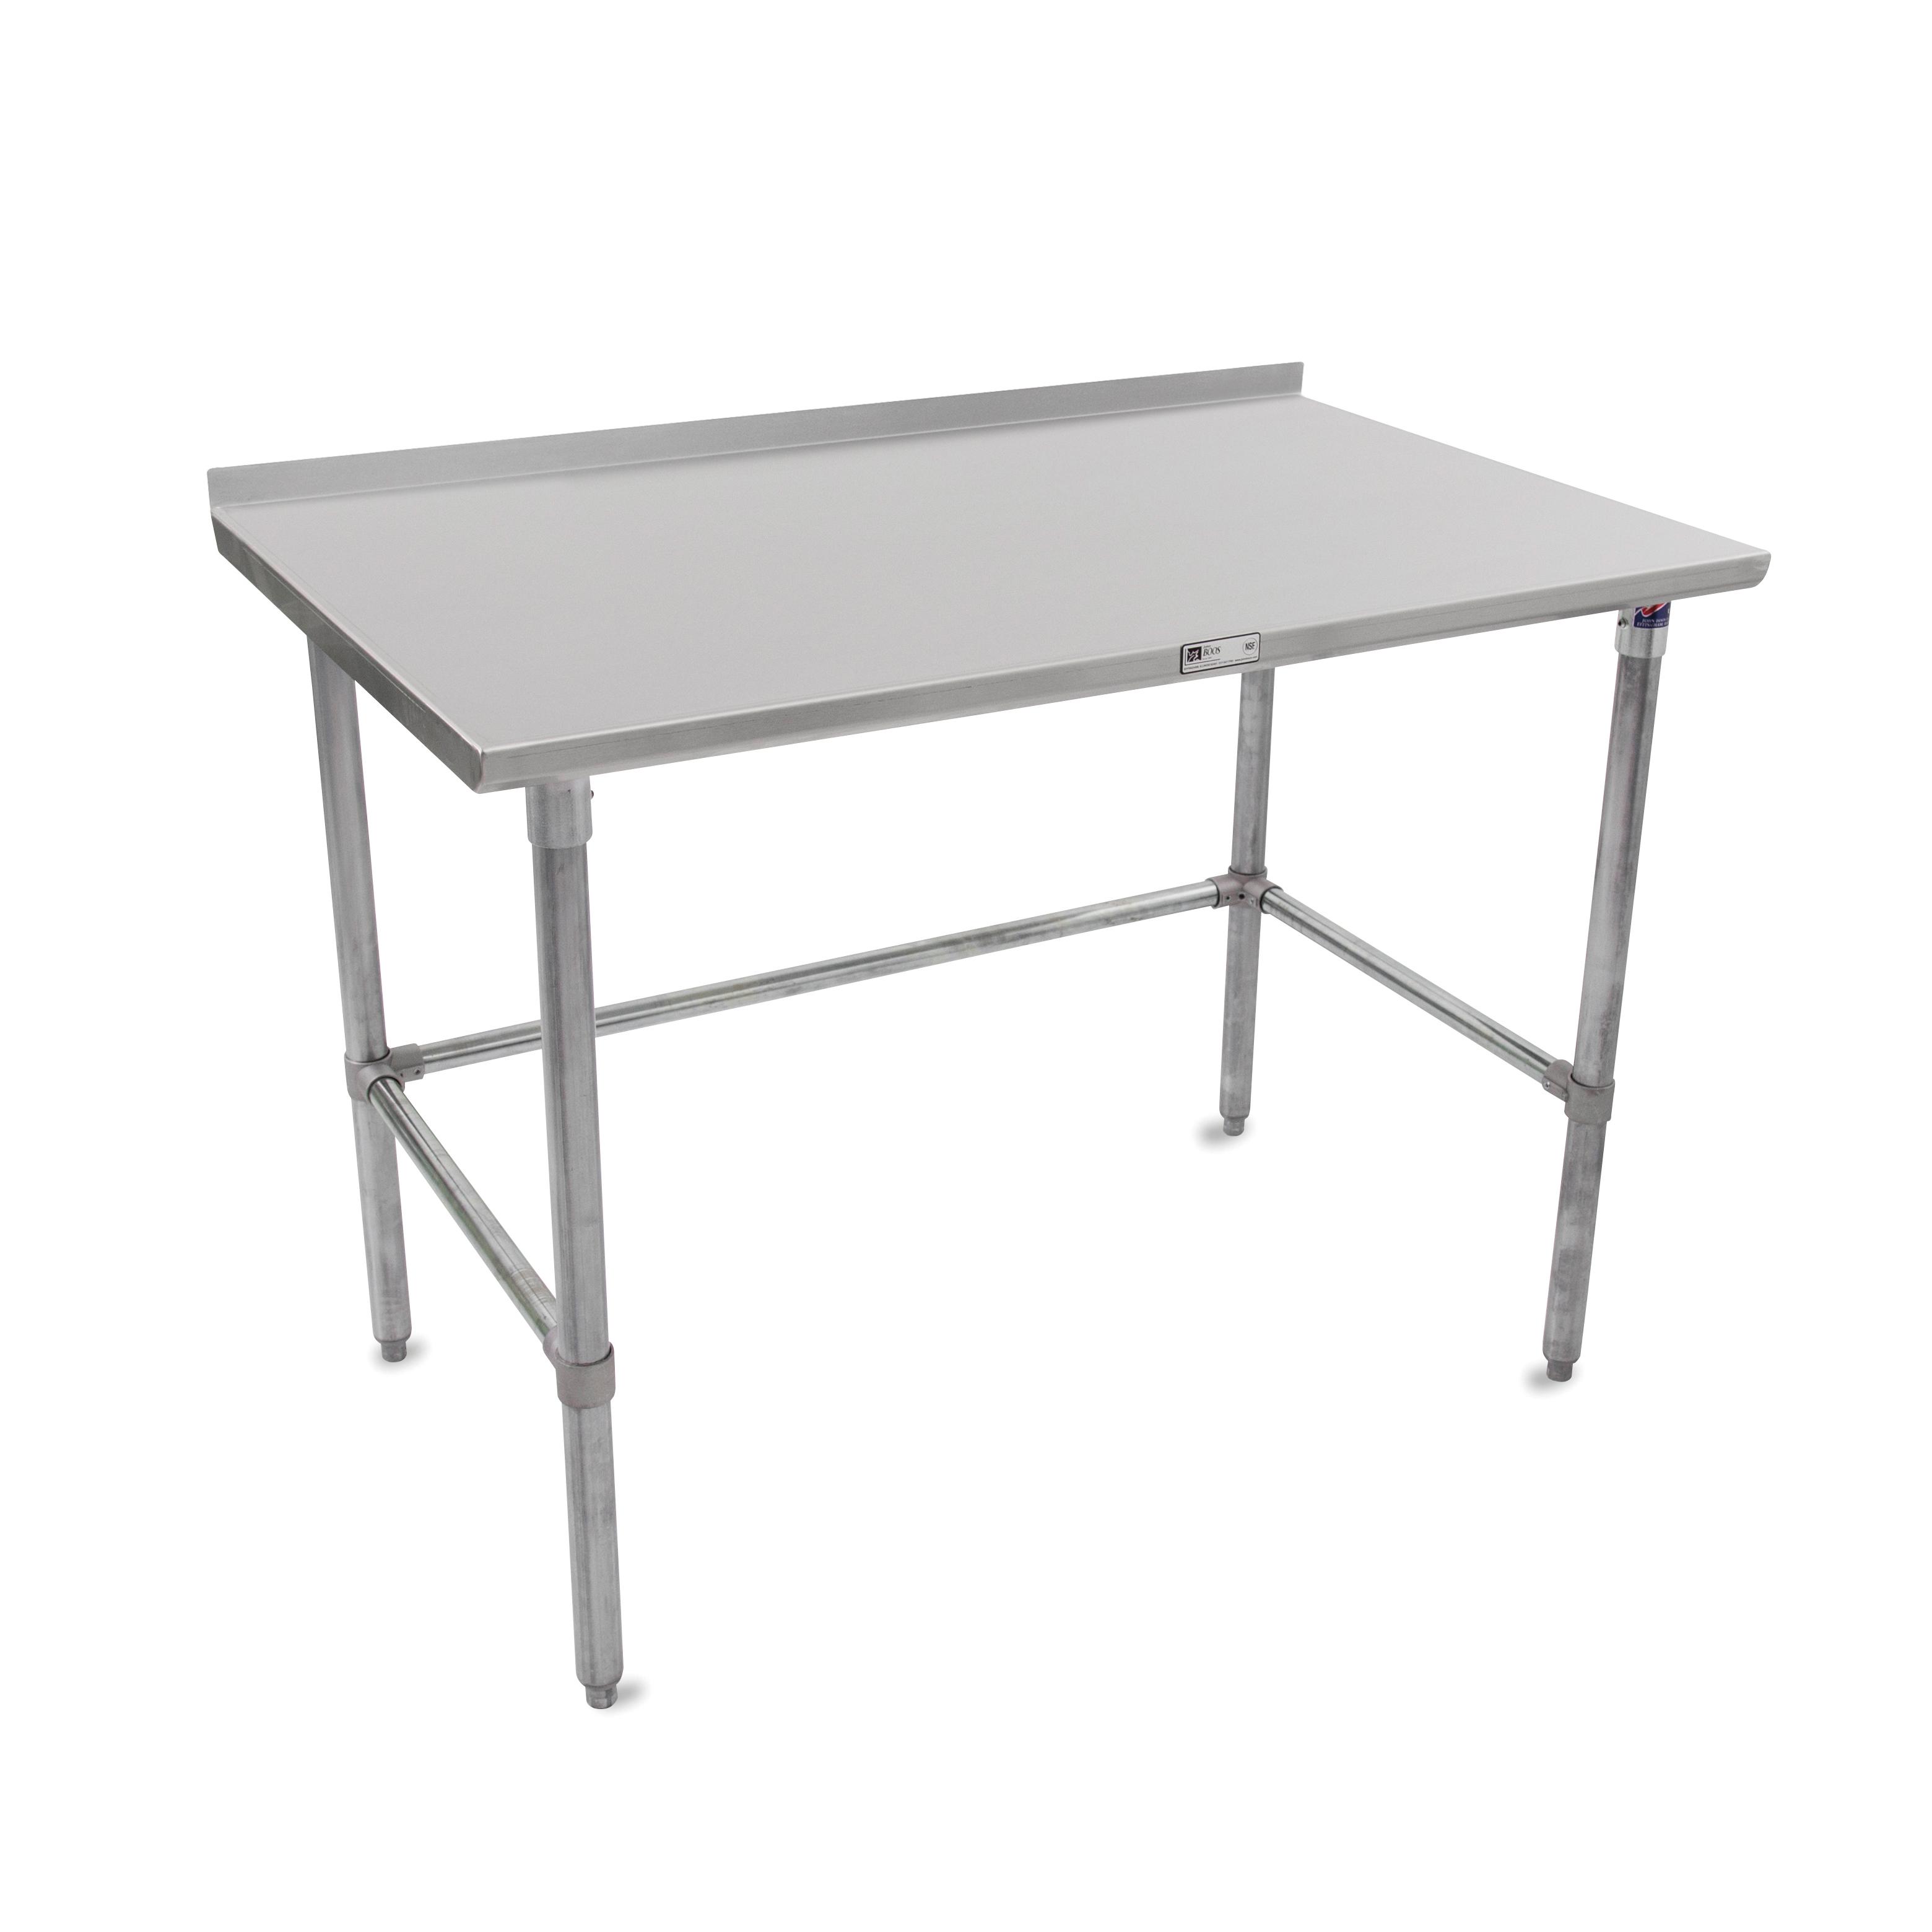 John Boos ST6R1.5-3048GBK work table,  40